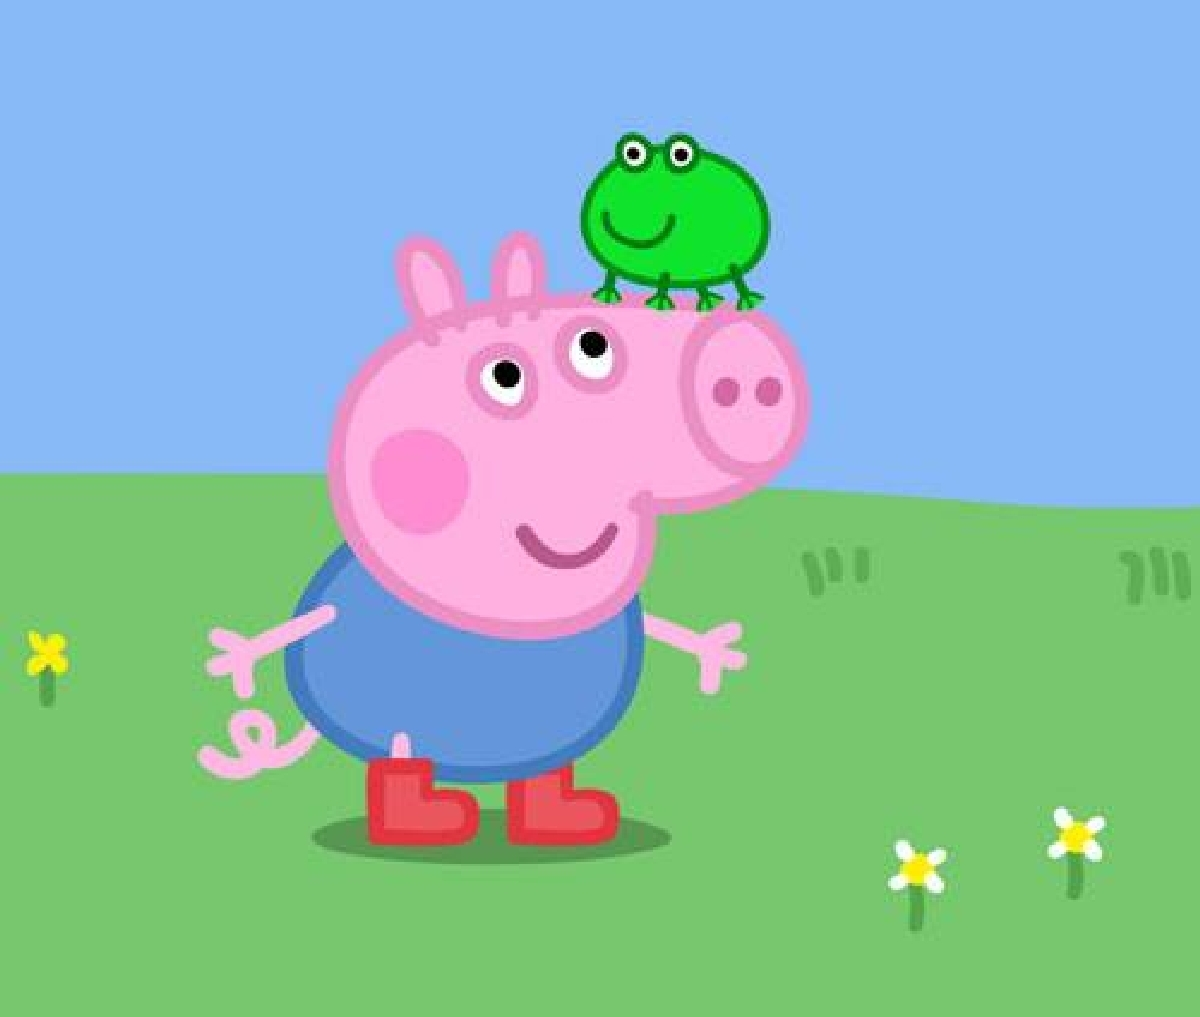 Peppa pig perché è l idolo dei bambini tgcom